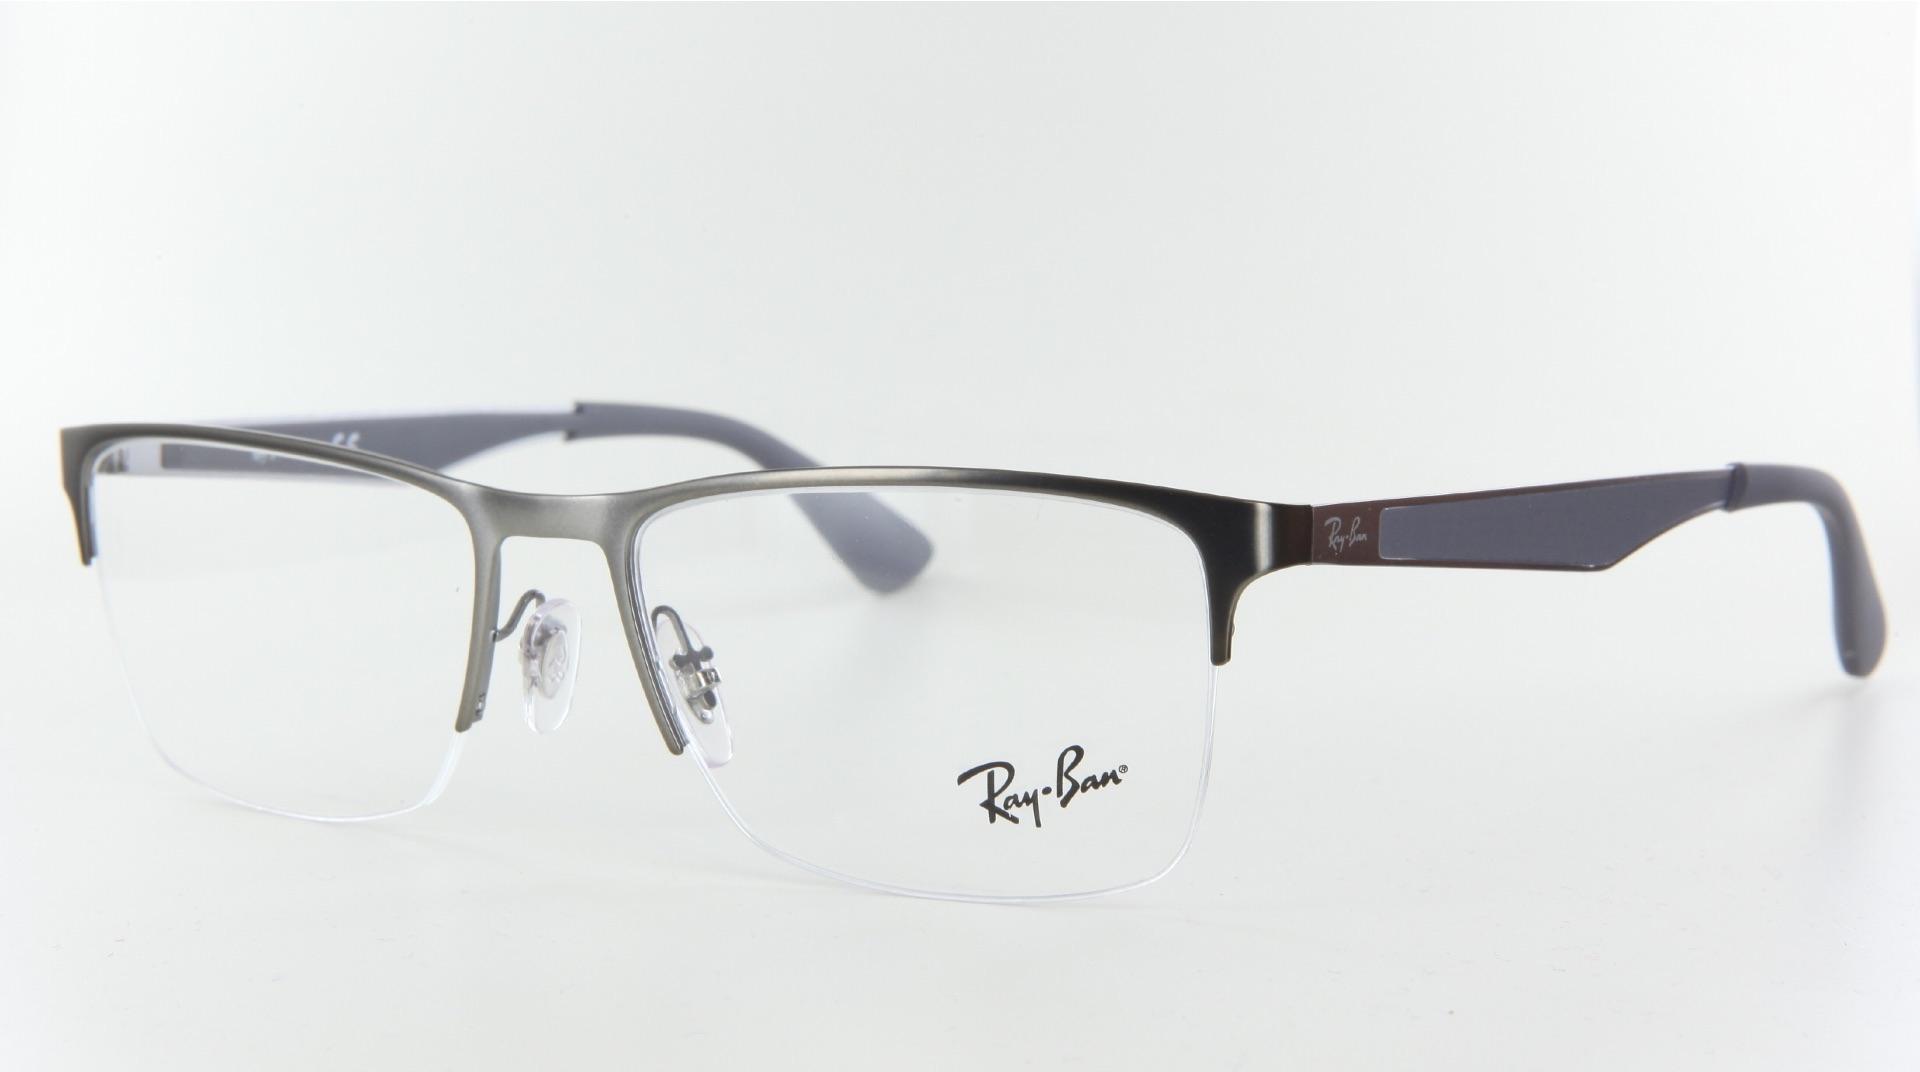 Ray-Ban - ref: 73599